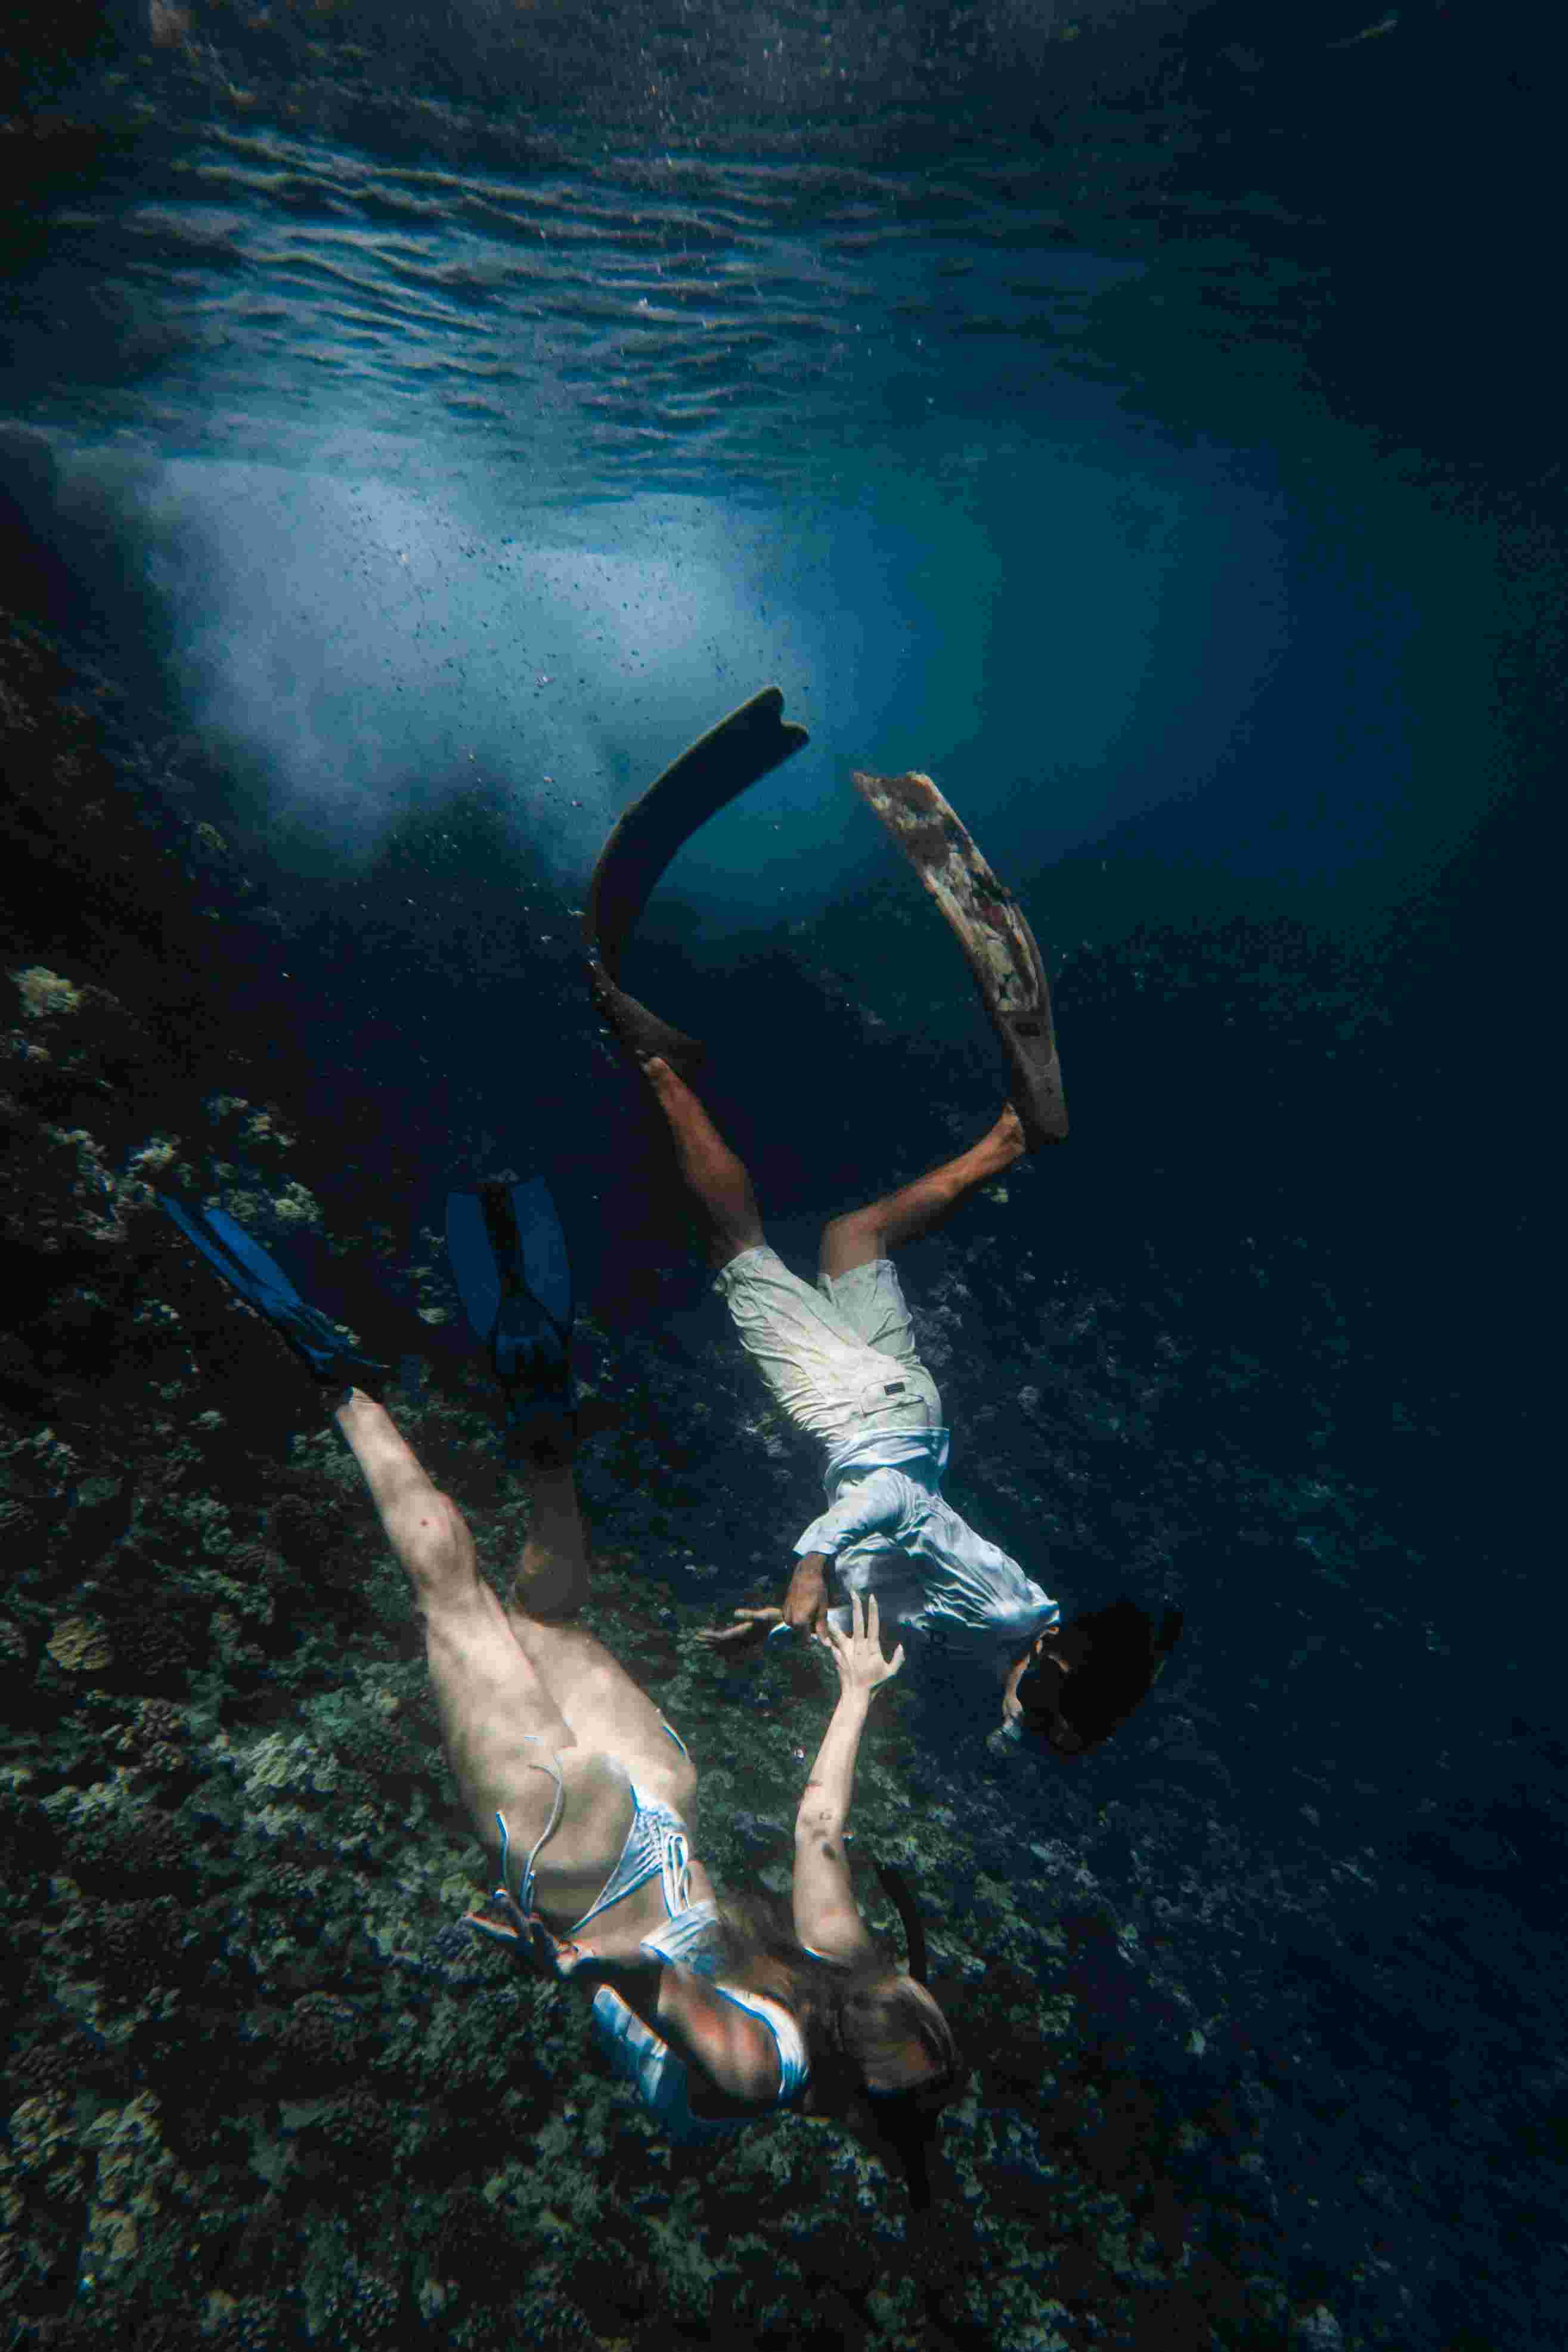 mengenal freediving, olahraga yang digeluti dikta